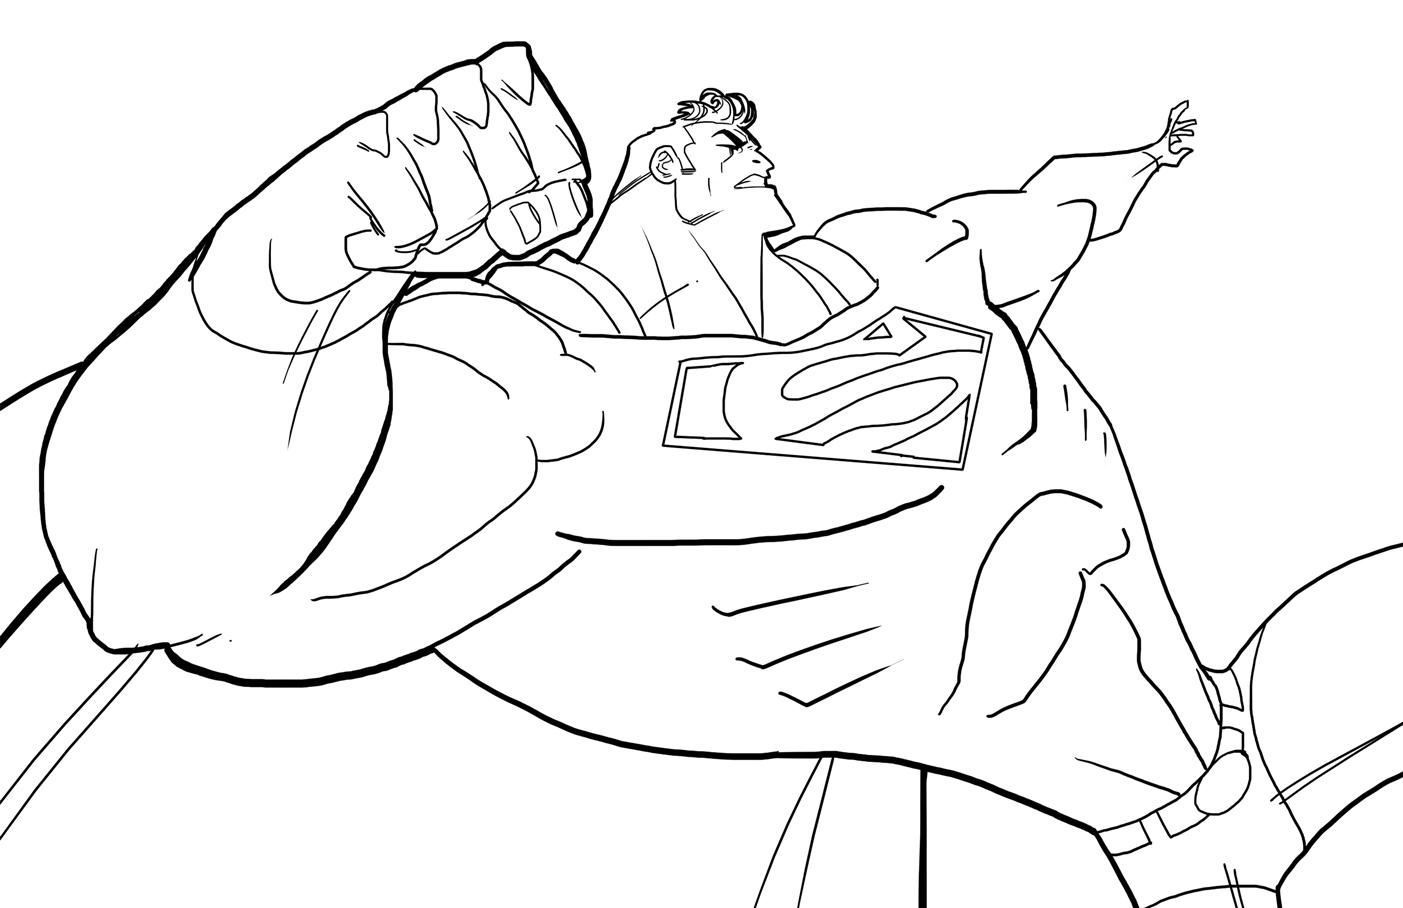 Drawn superman foreshortened Finished! Live: 2011 November theFranchize: